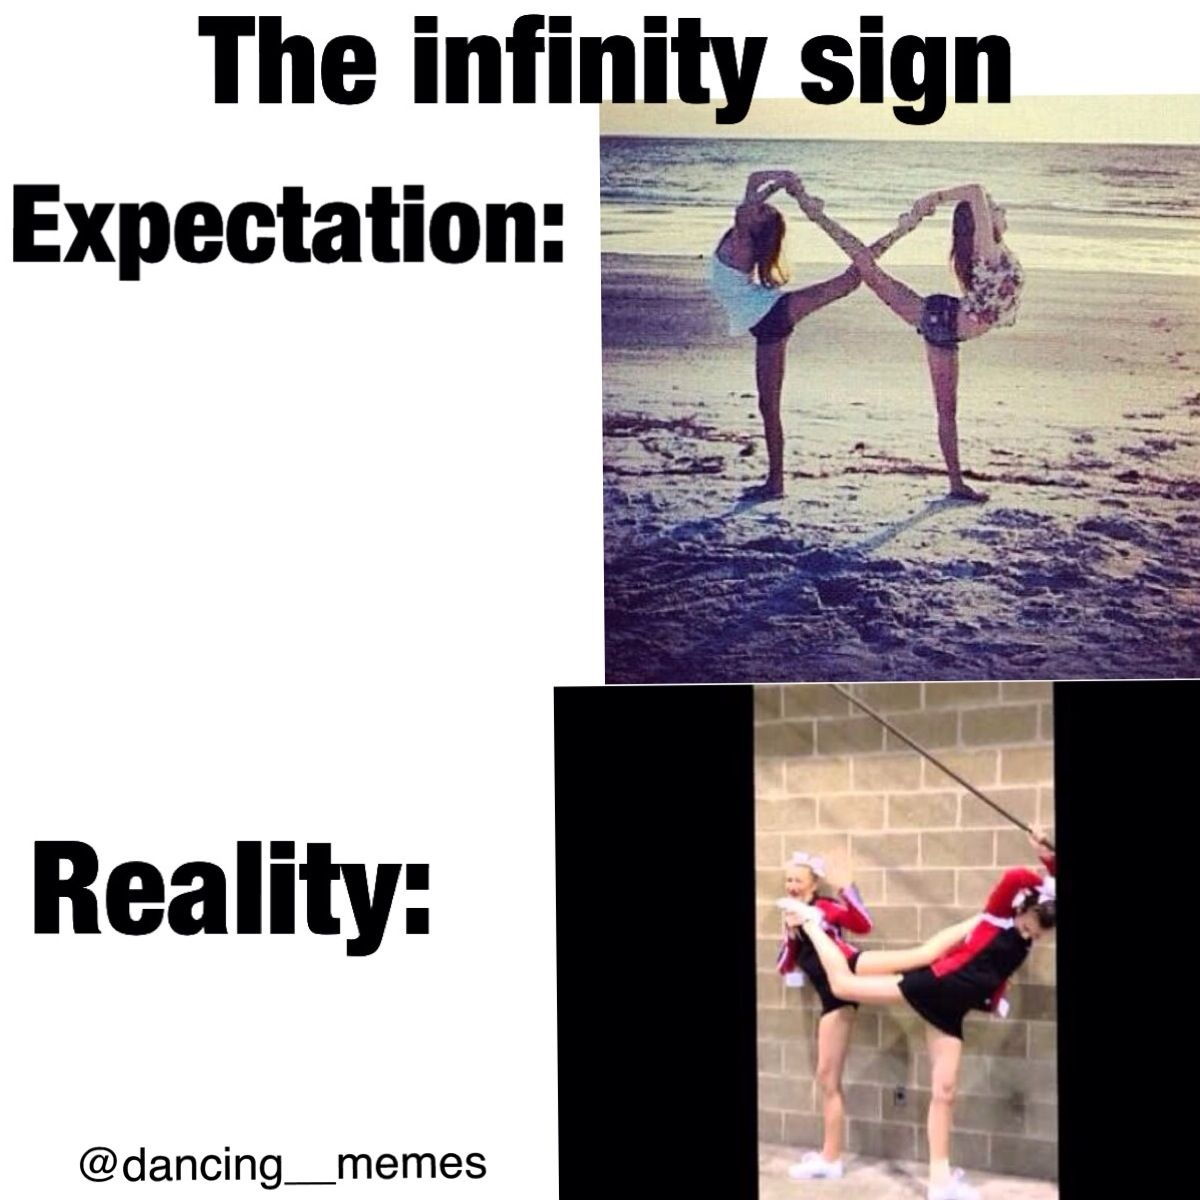 @dancing__memes ballet and dance meme Instagram account